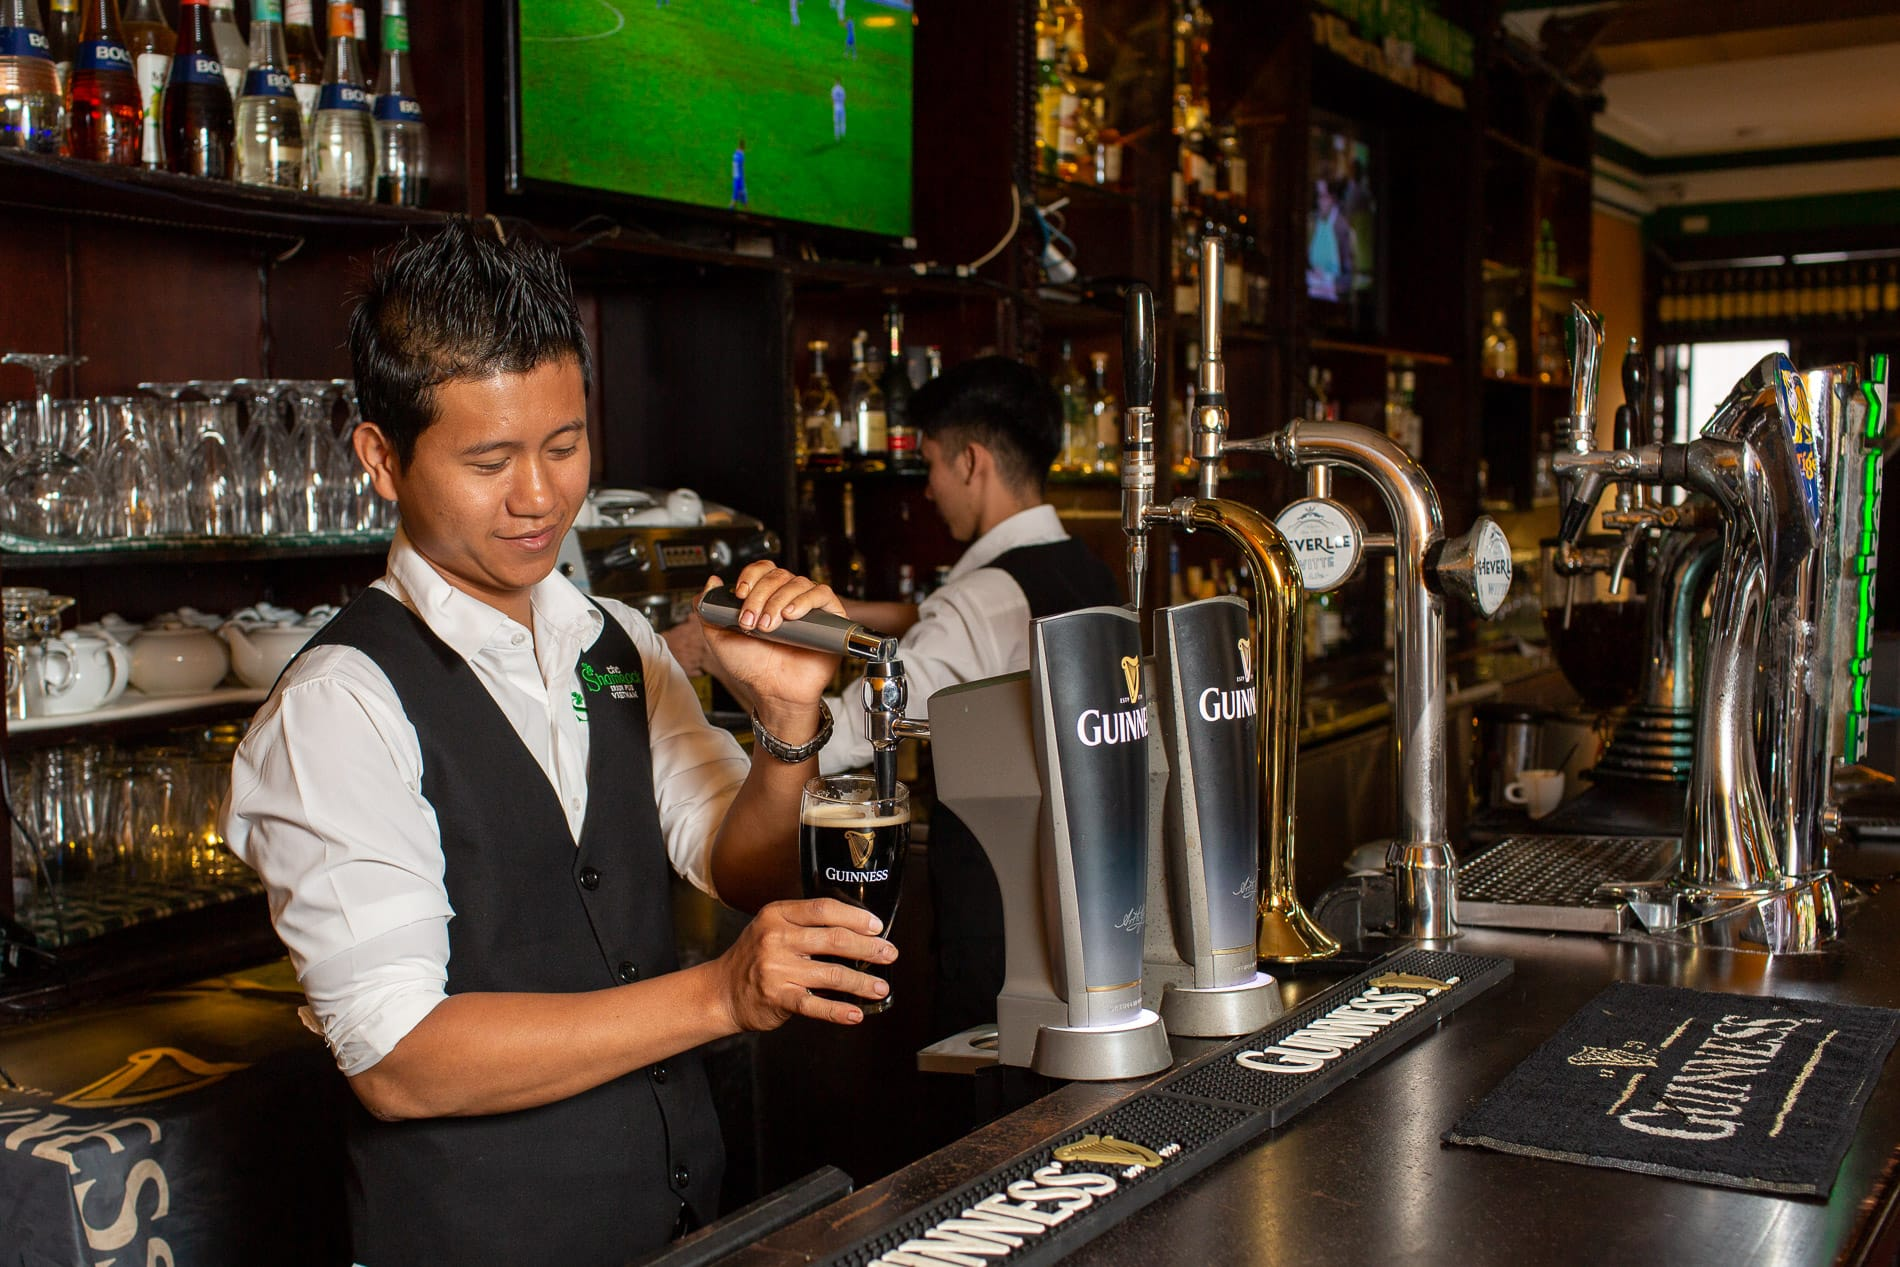 Guinness in Vietnam